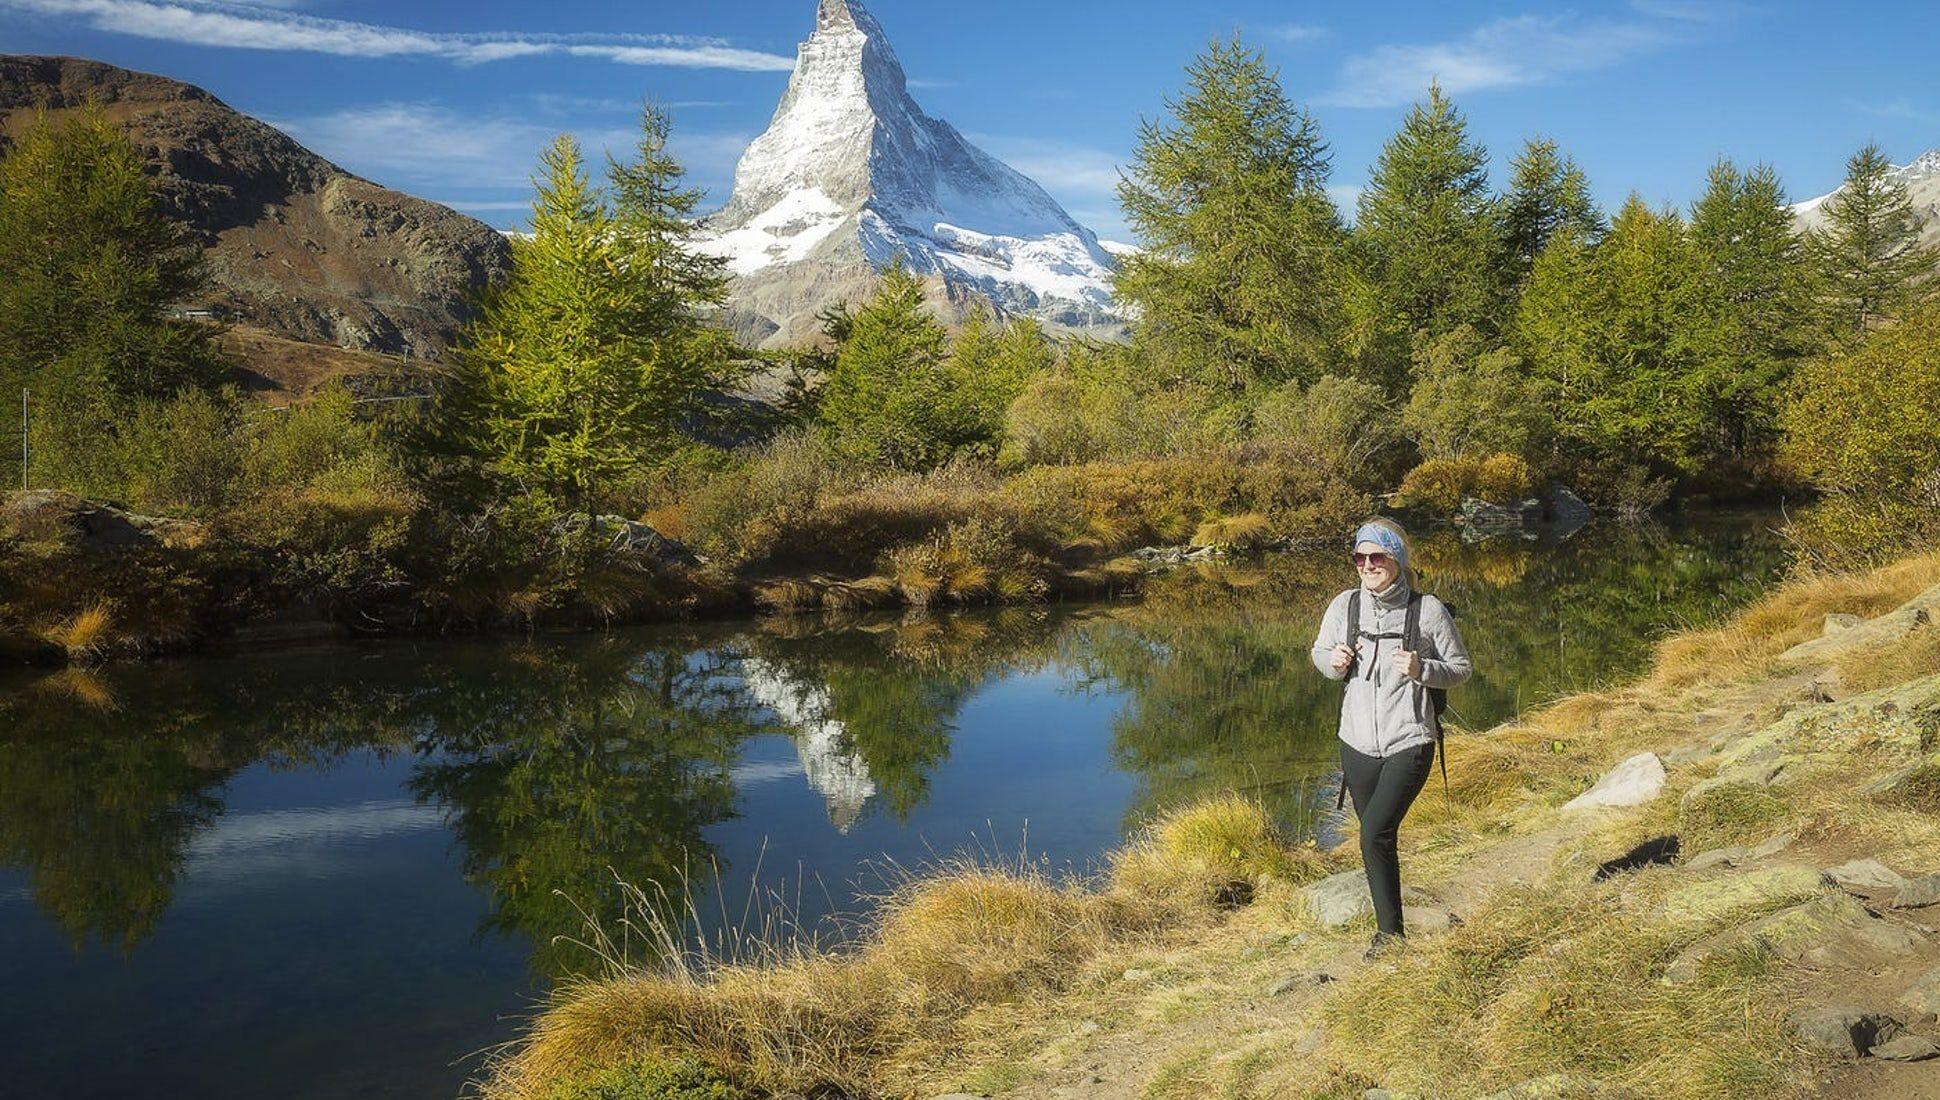 Exploring Swiss Alps, Schynige Platte - Moname Magazine